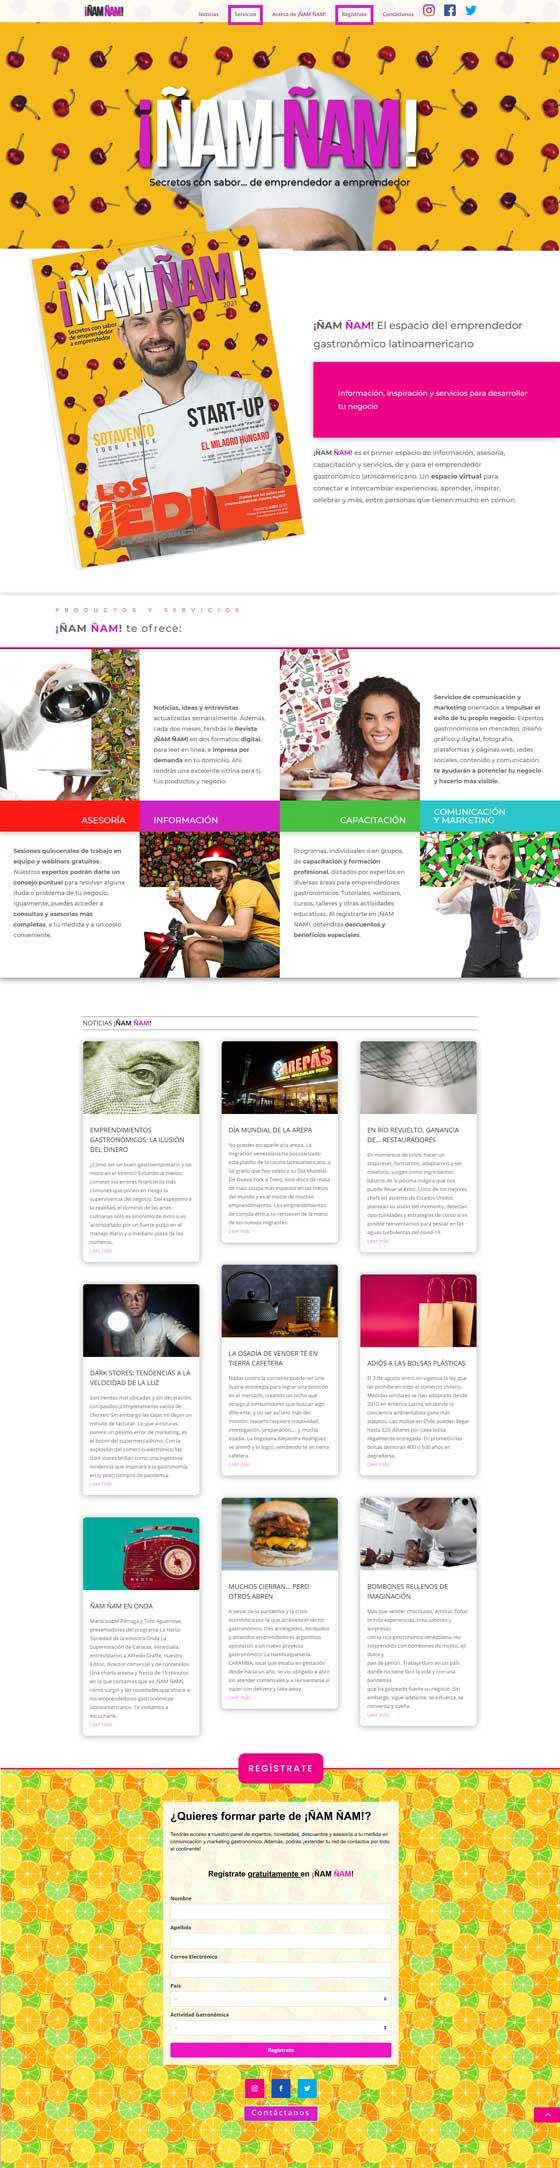 sitio web Emprendedores Ñam Ñam